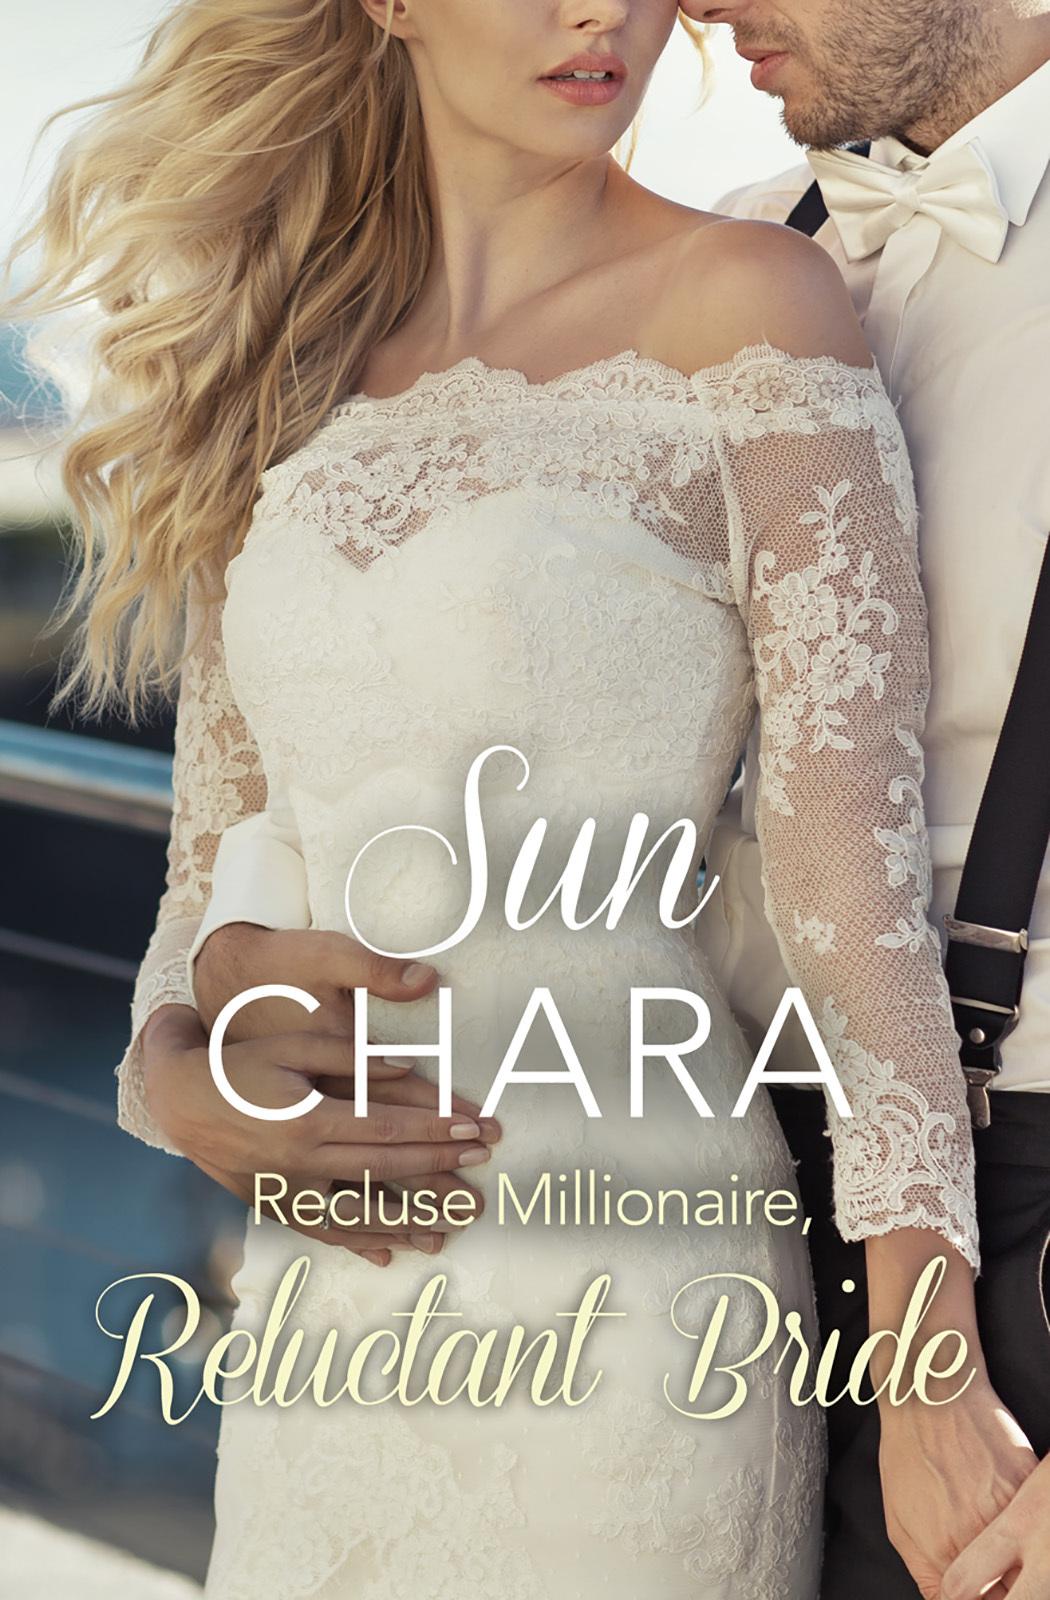 лучшая цена Sun Chara Recluse Millionaire, Reluctant Bride